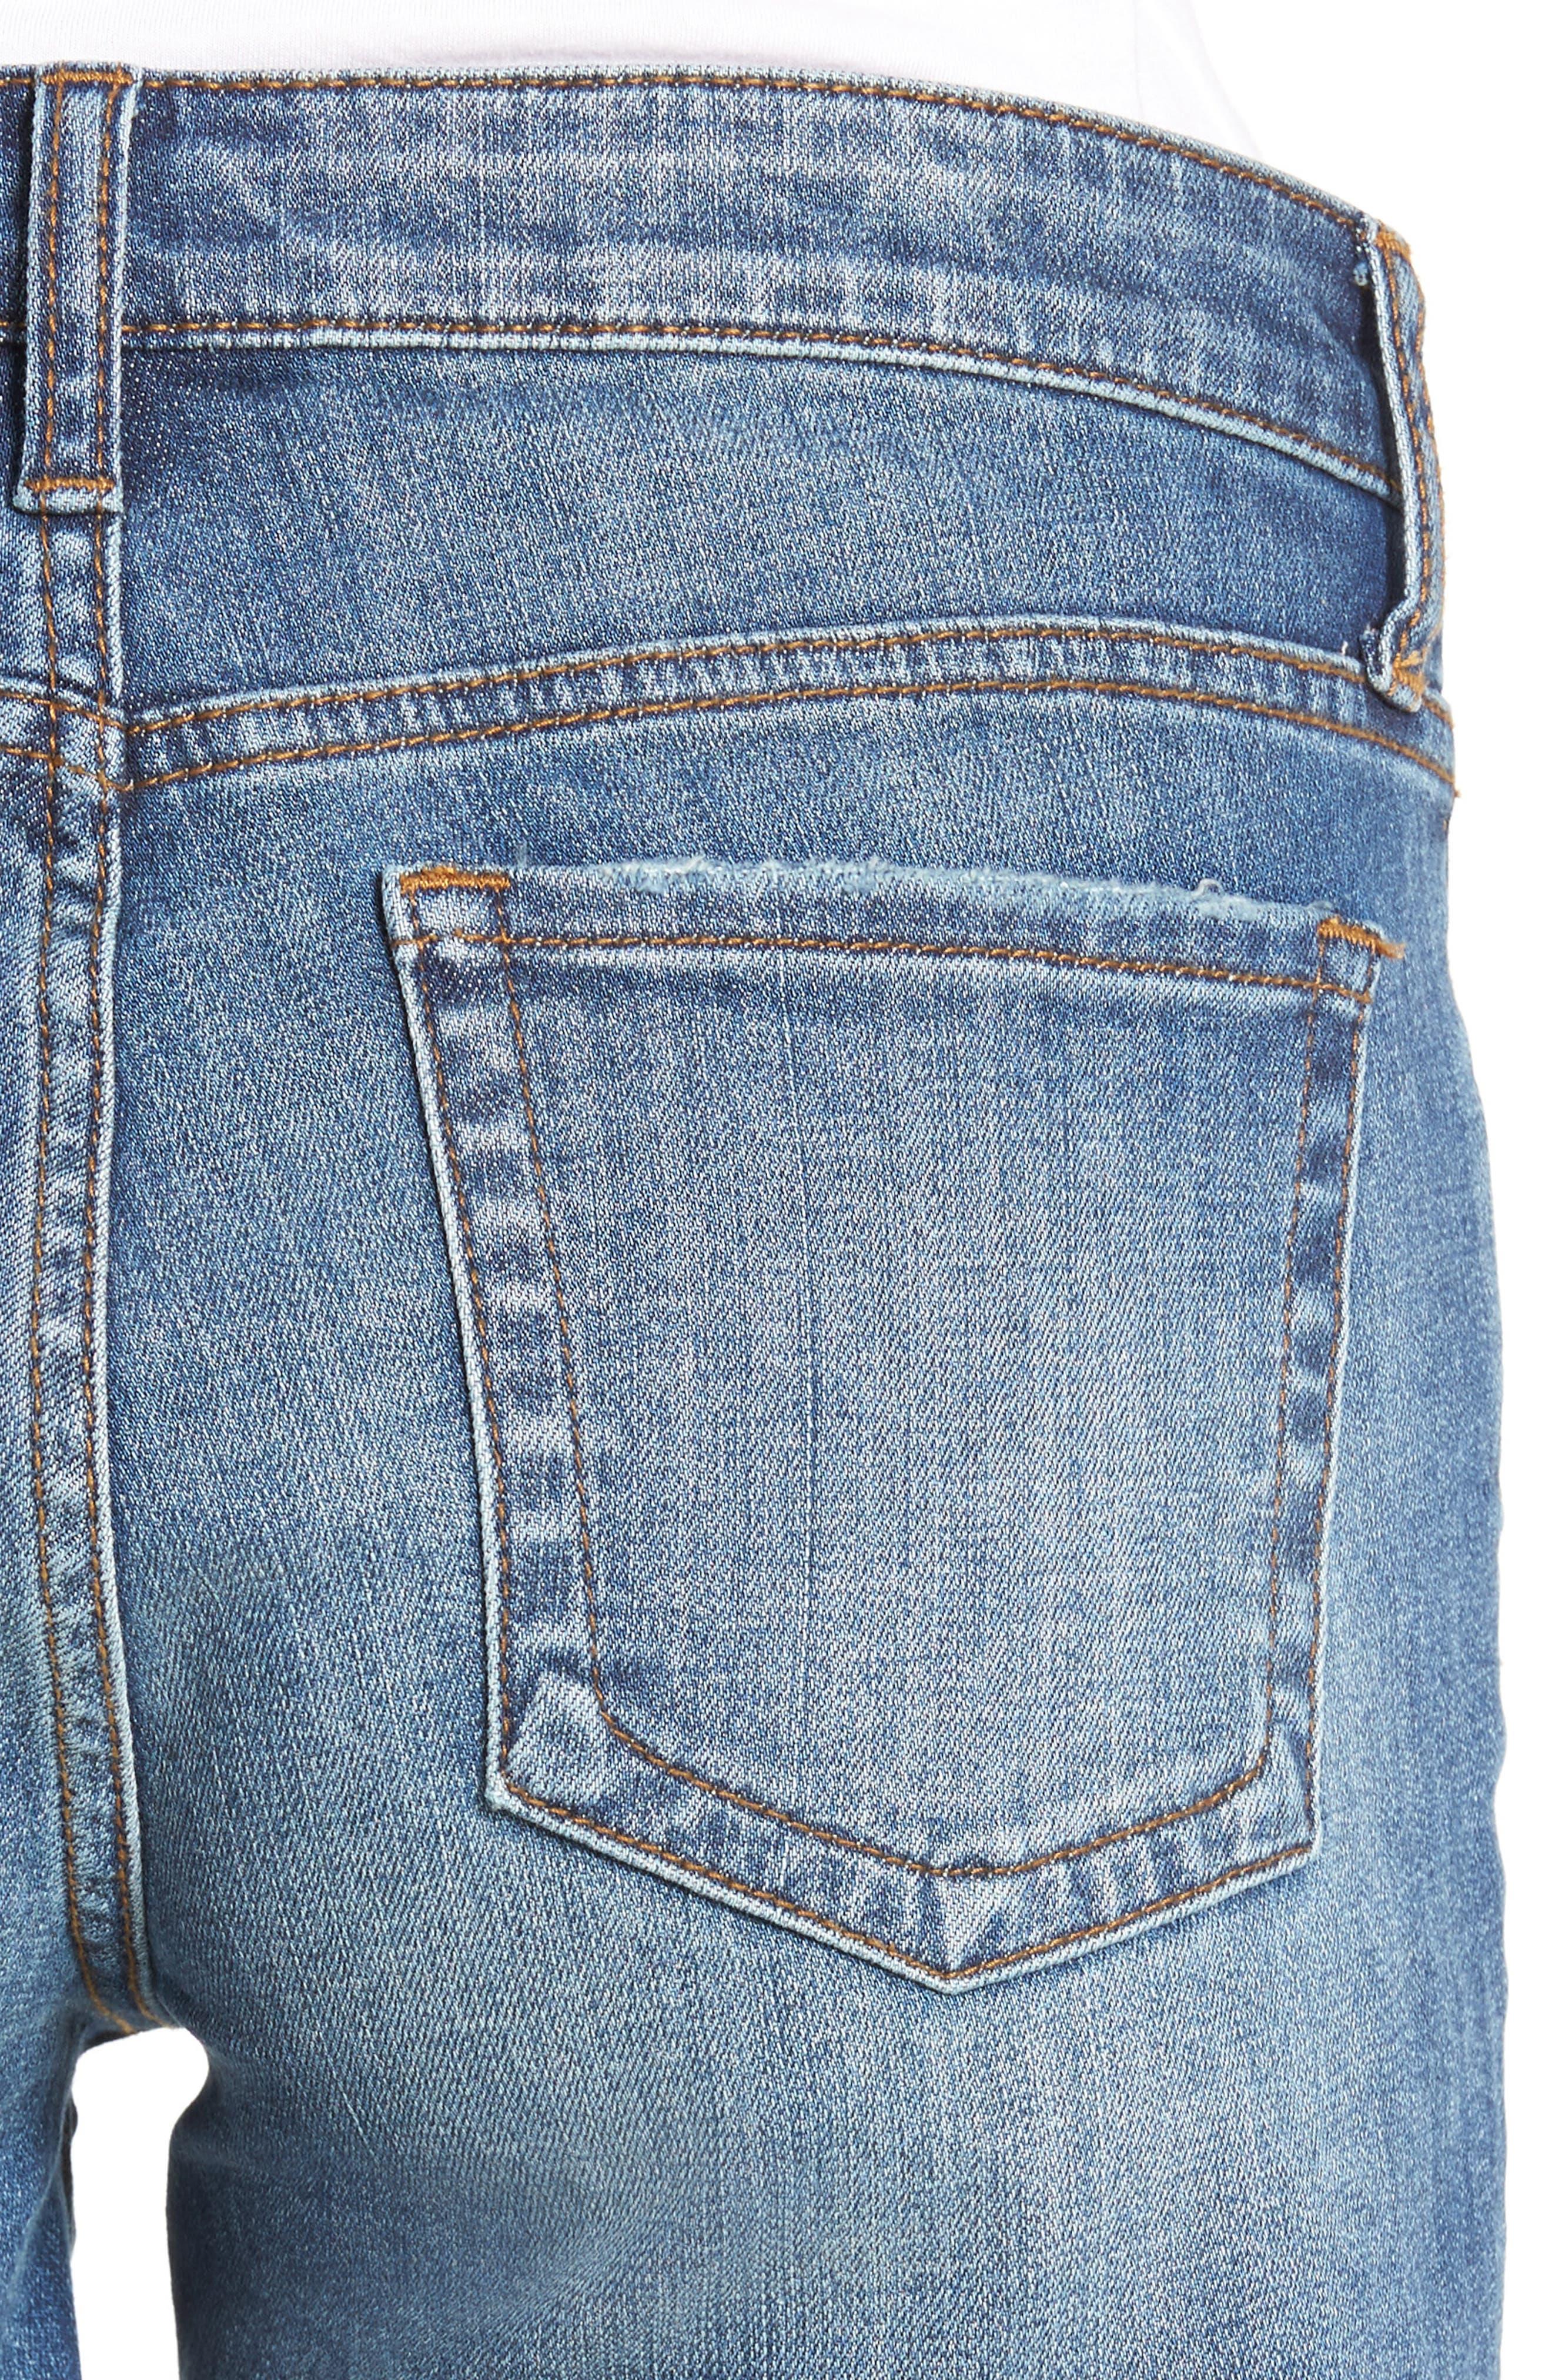 Gidget Denim Shorts,                             Alternate thumbnail 4, color,                             CONSOLIDATED